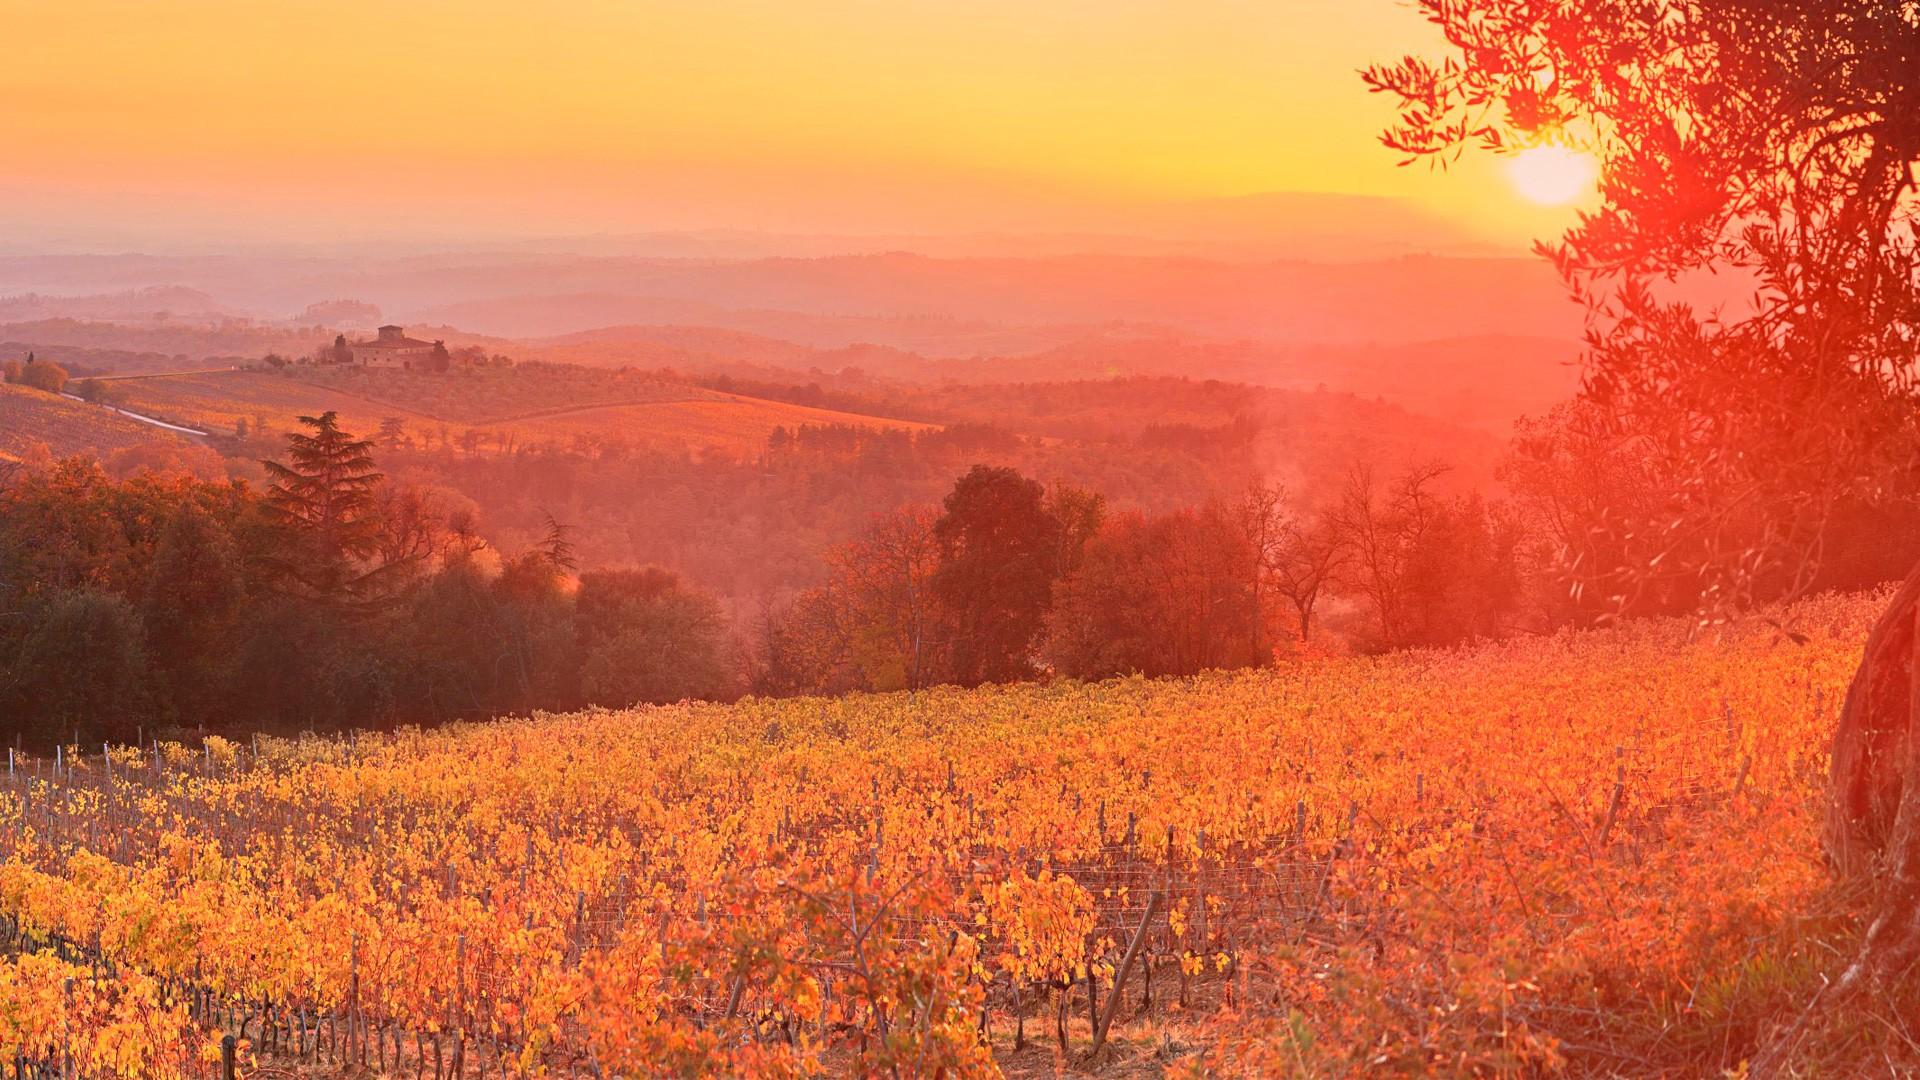 Free Widescreen Wallpaper Fall Vineyard Sunset Siena Tuscany Italy Wallpapers Hd